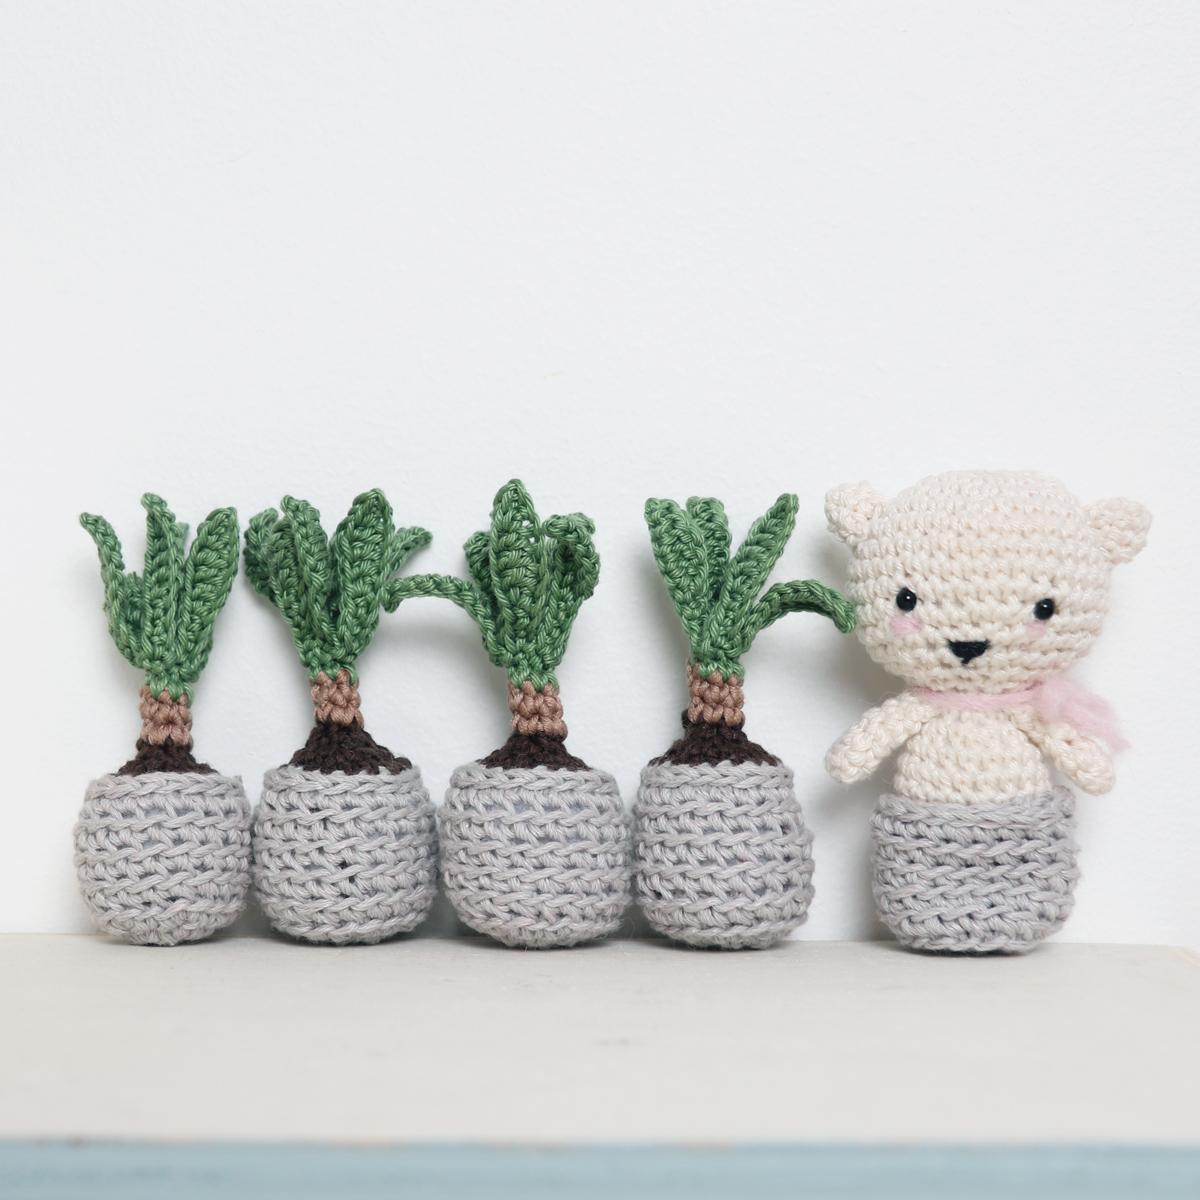 Crochet Mini Yucca Plant by Ina Rho